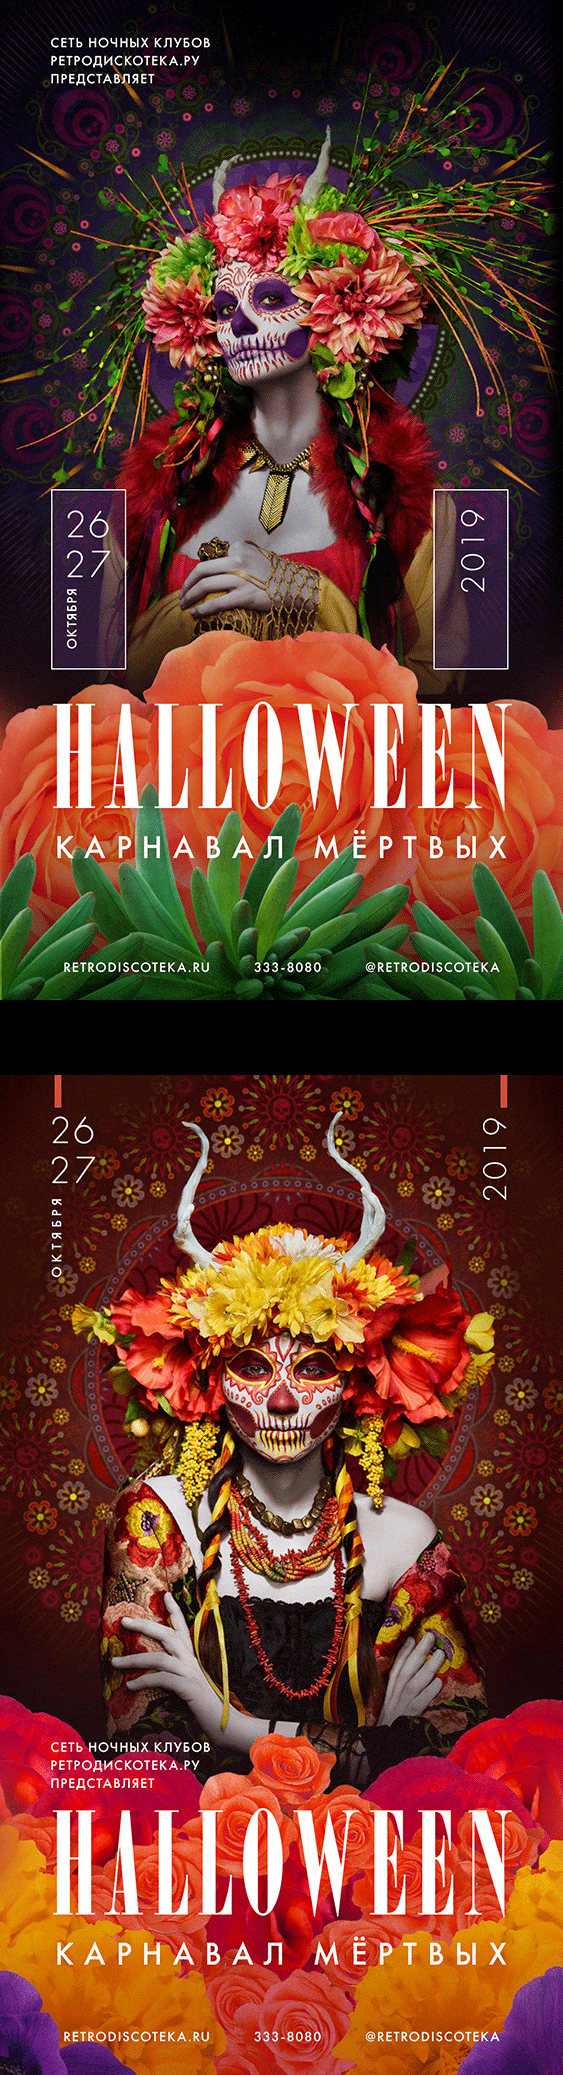 Дизайн афиши Хэллоуин 2019 для сети ночных клубов фото f_5415c6c833e32406.jpg